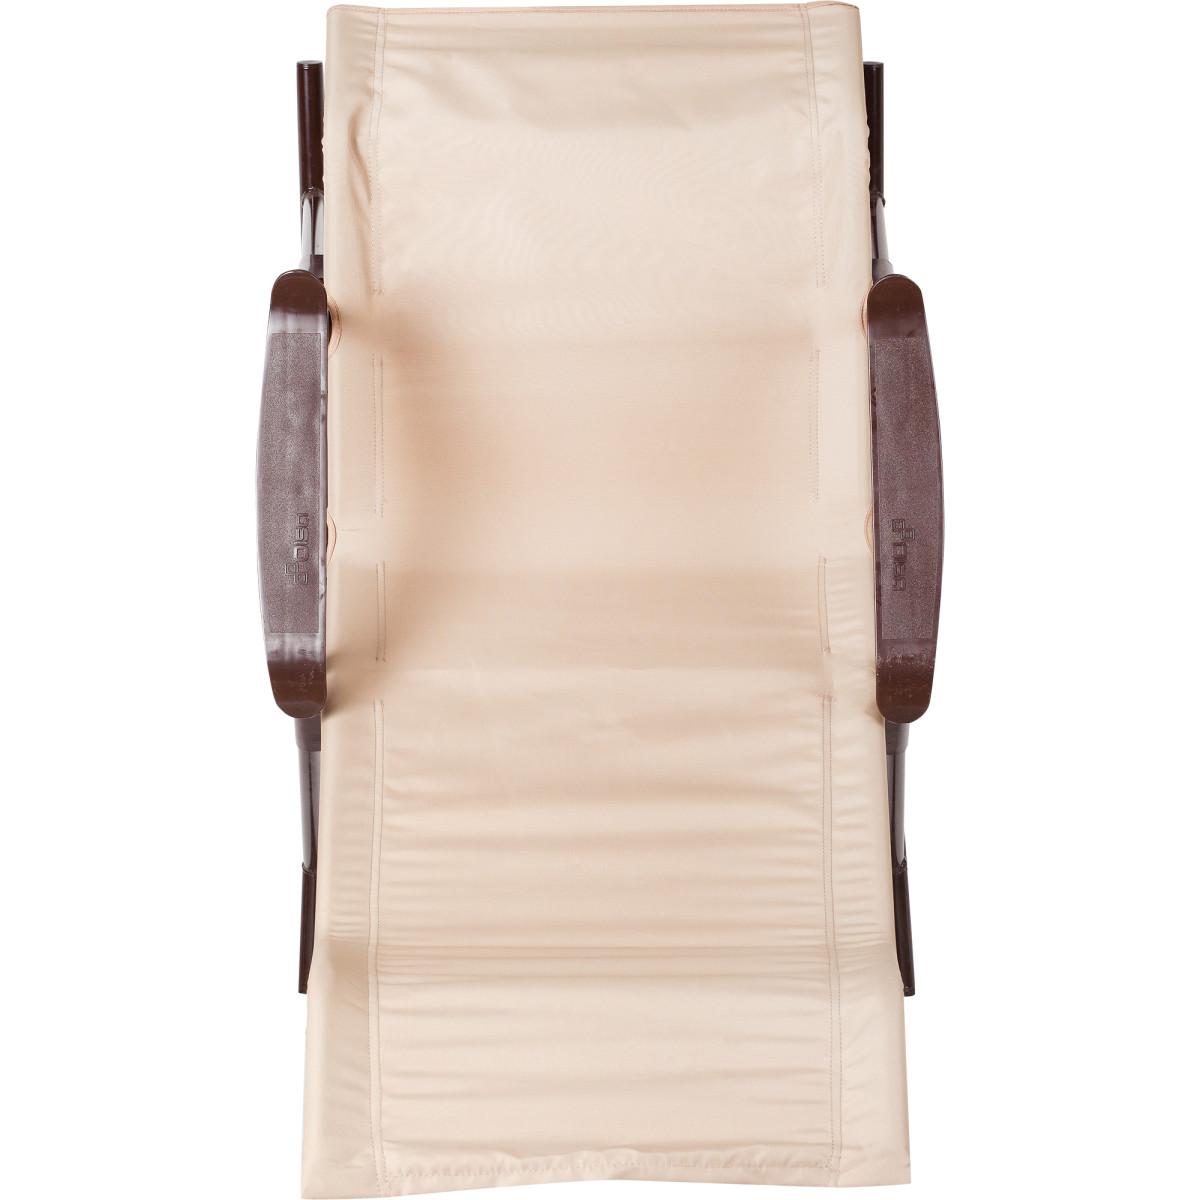 Кресло-Качалка Нарочь 110Х62Х94 Металл Коричневый/Бежевый